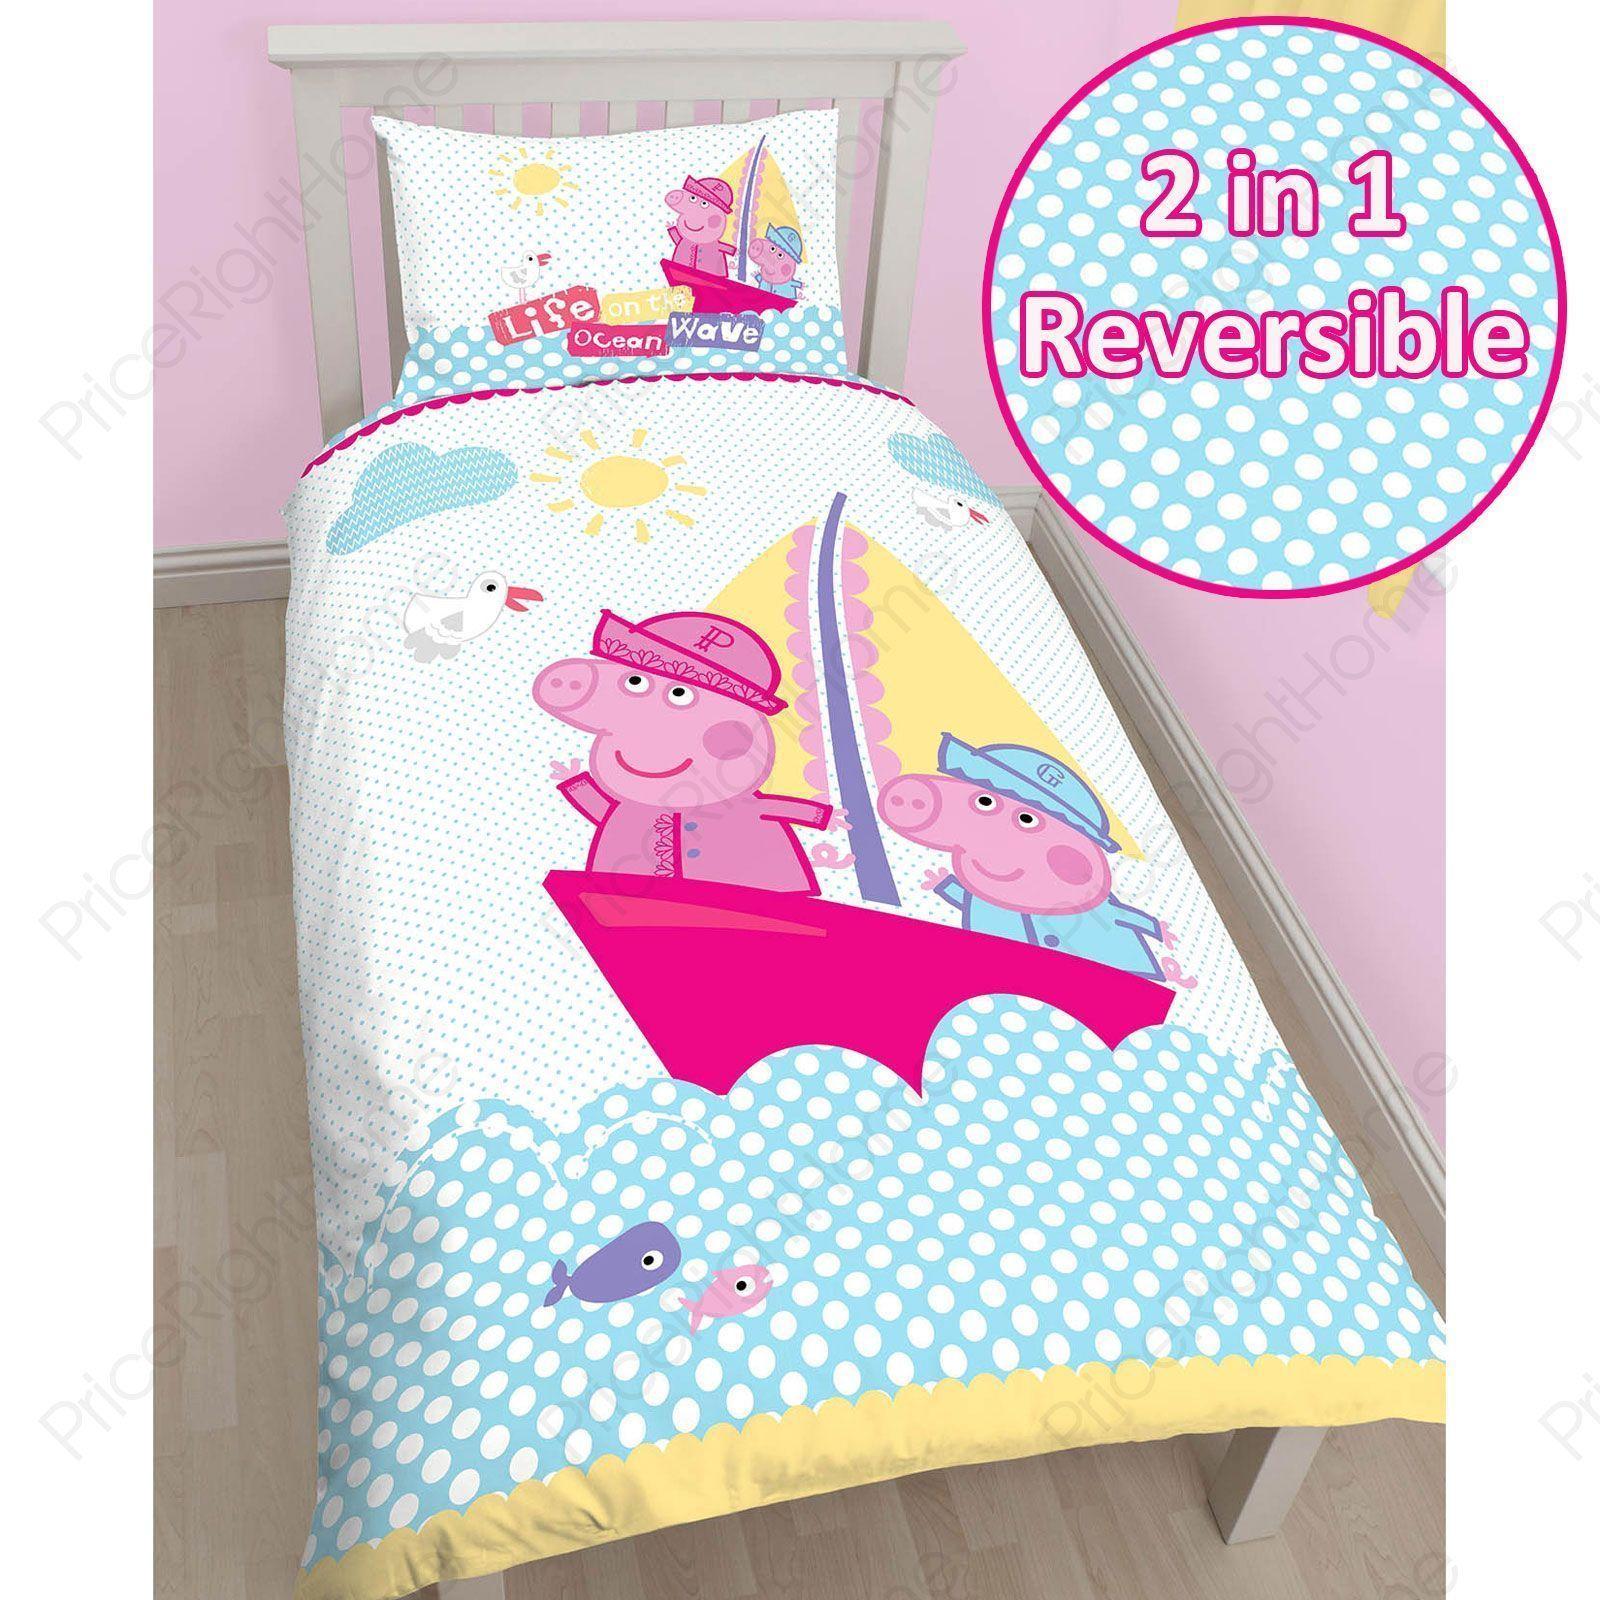 Peppa Pig & George 'Nautical' Single Duvet Cover Set | Products : peppa pig quilt cover set - Adamdwight.com